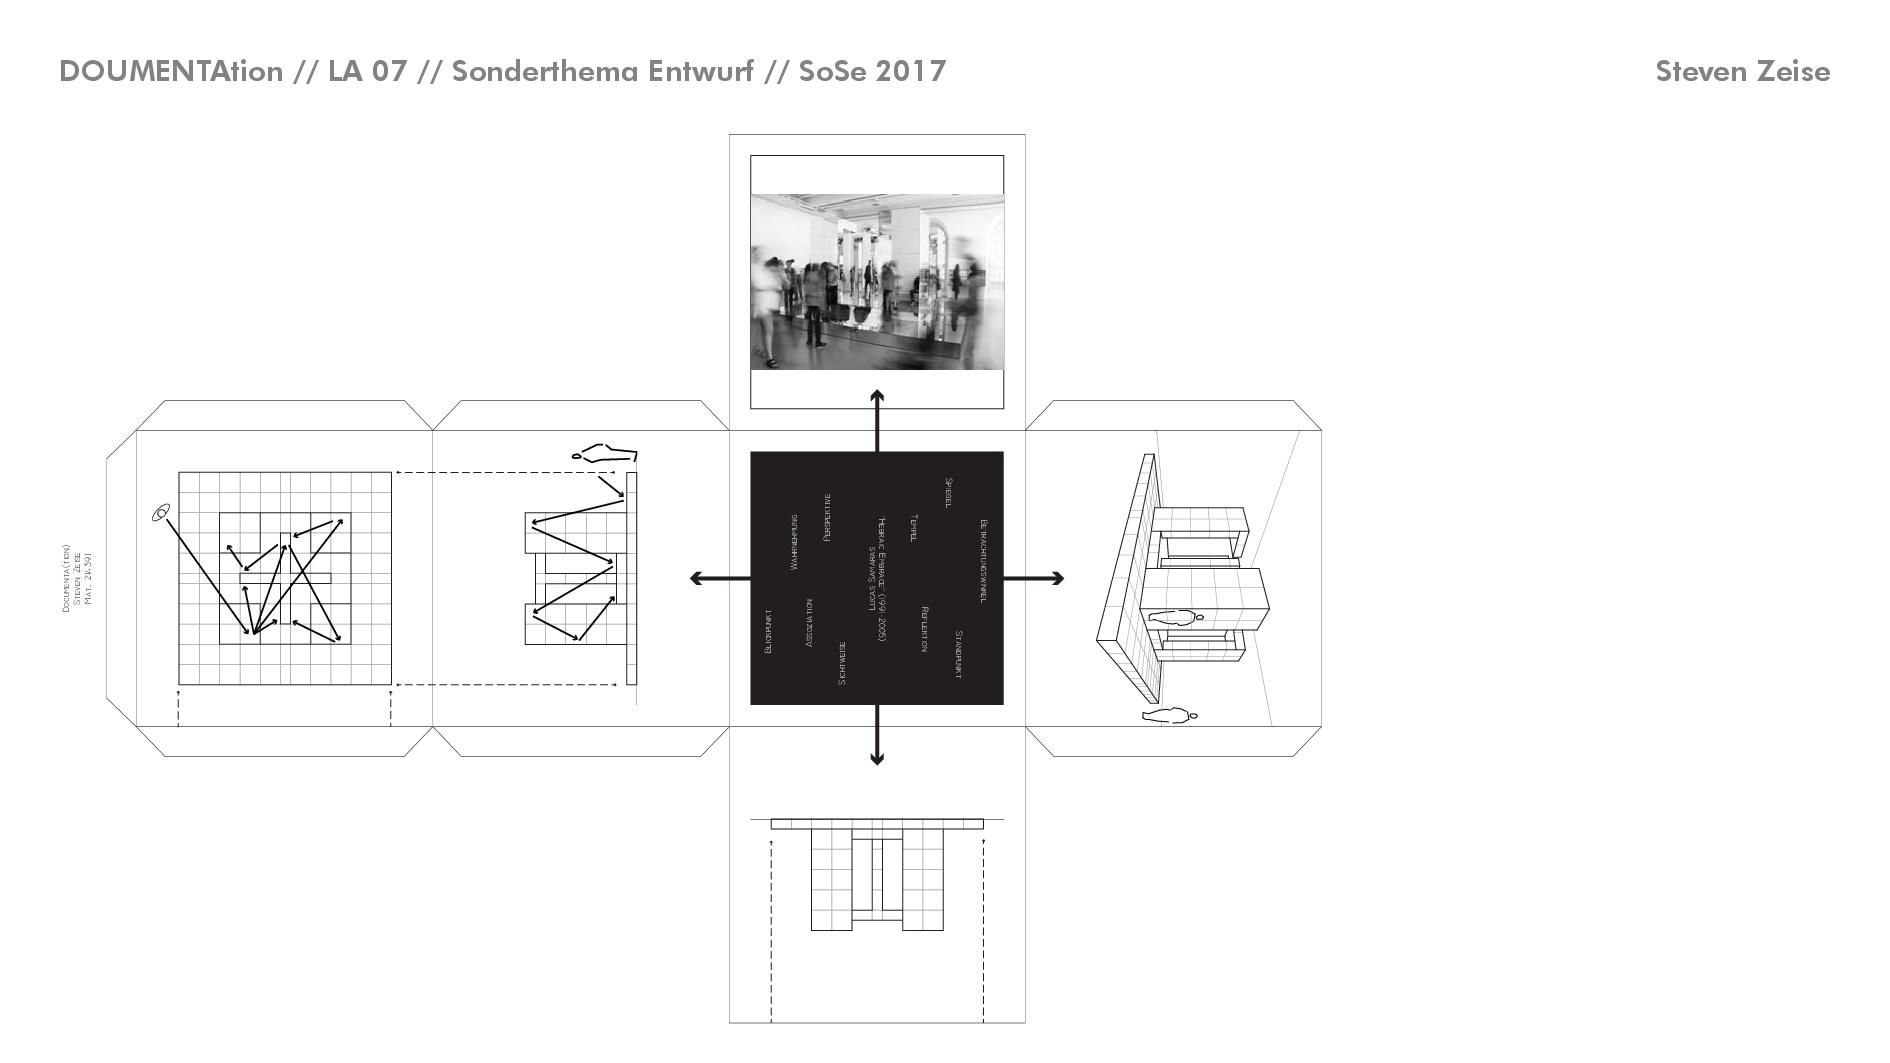 NEU Sonderthema Entwerfen SoSe 17 011